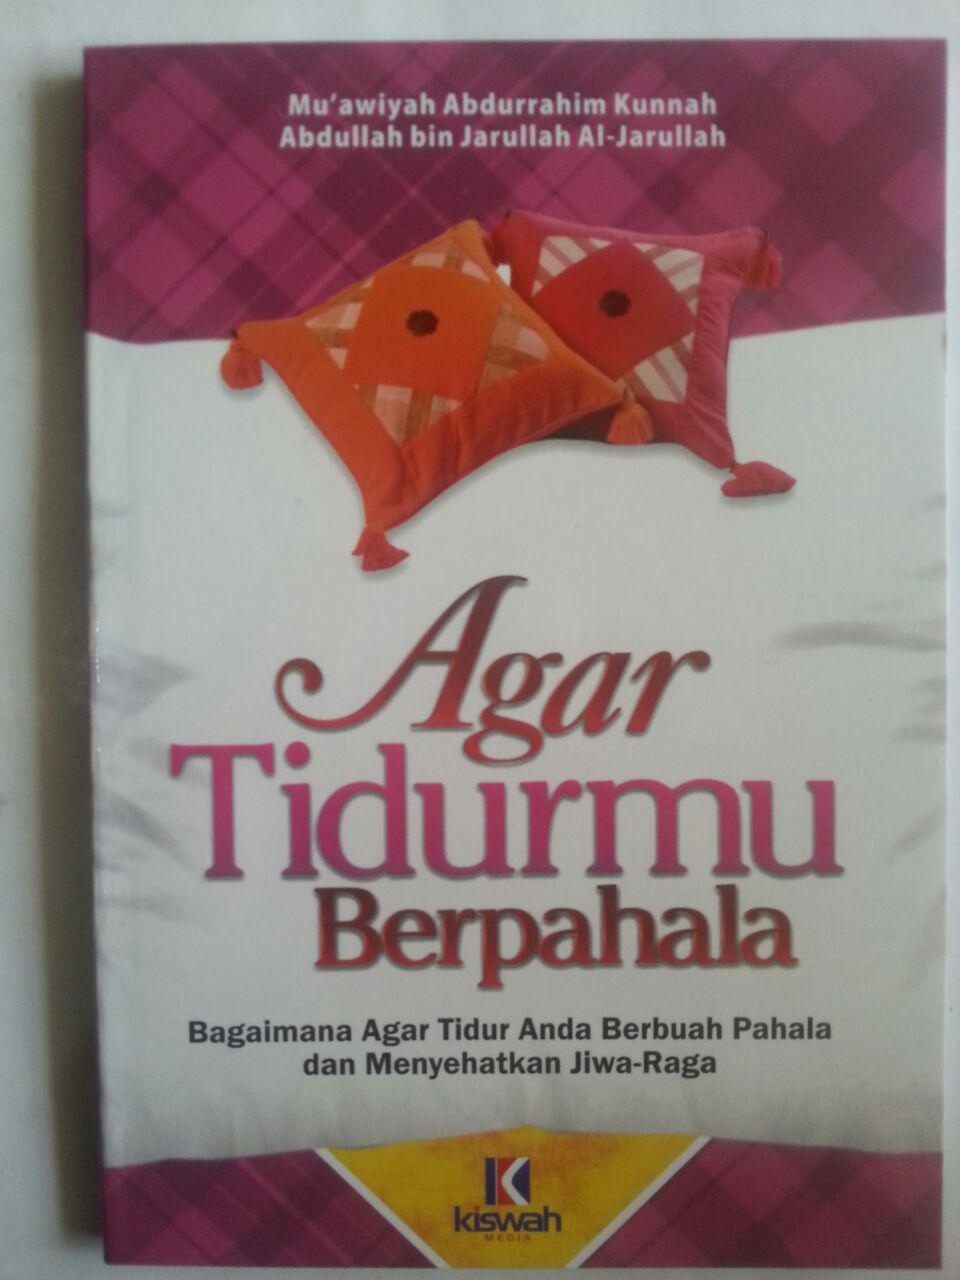 Buku Agar Tidurmu Berpahala Dan Menyehatkan Jiwa Raga cover 2